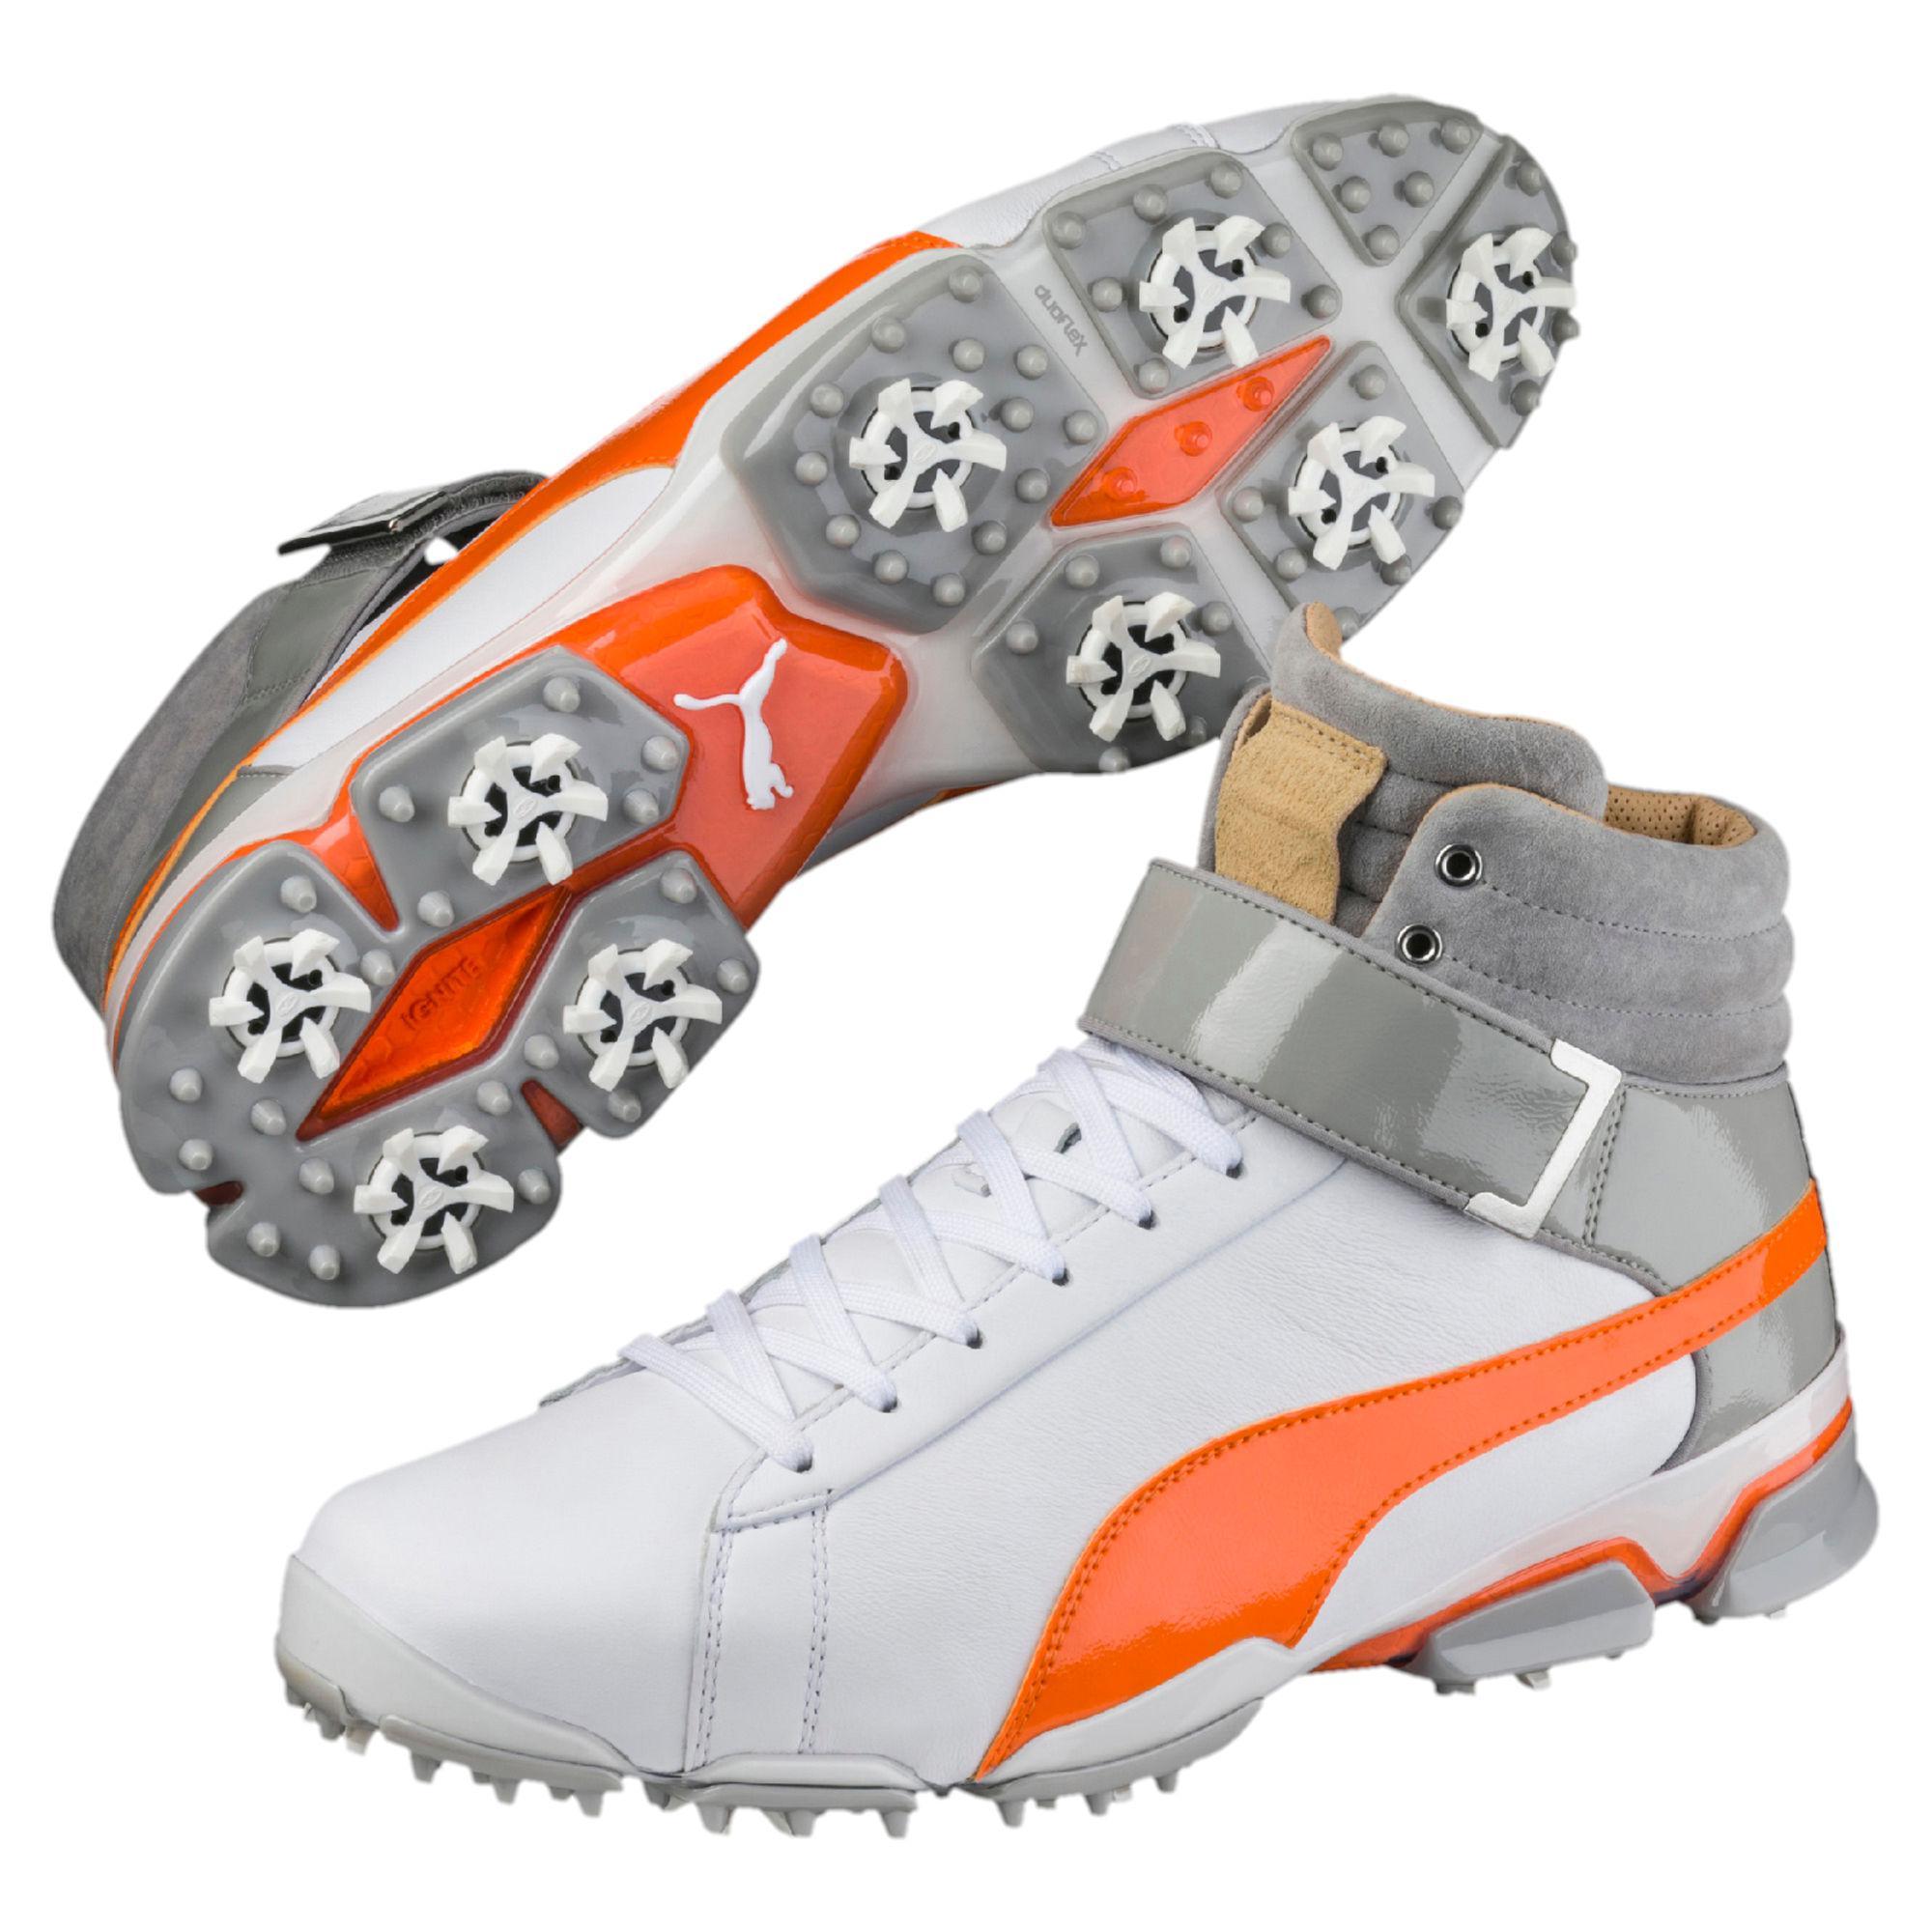 86cedb655a68 Lyst - PUMA Titantour Ignite High-top Men s Golf Shoes in White for Men